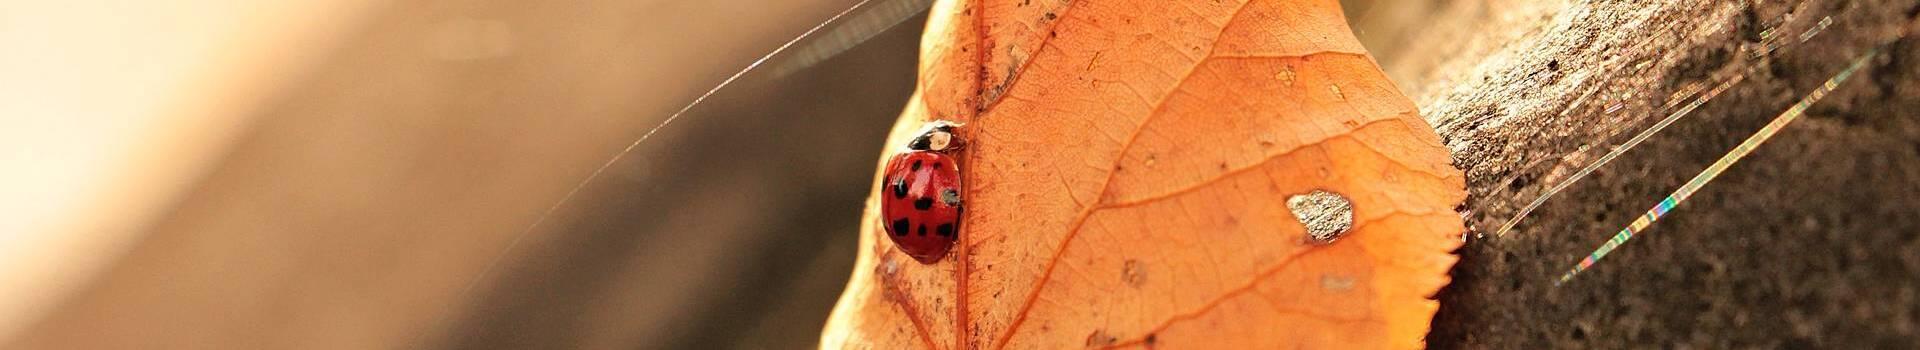 ladybug-1789065_1920